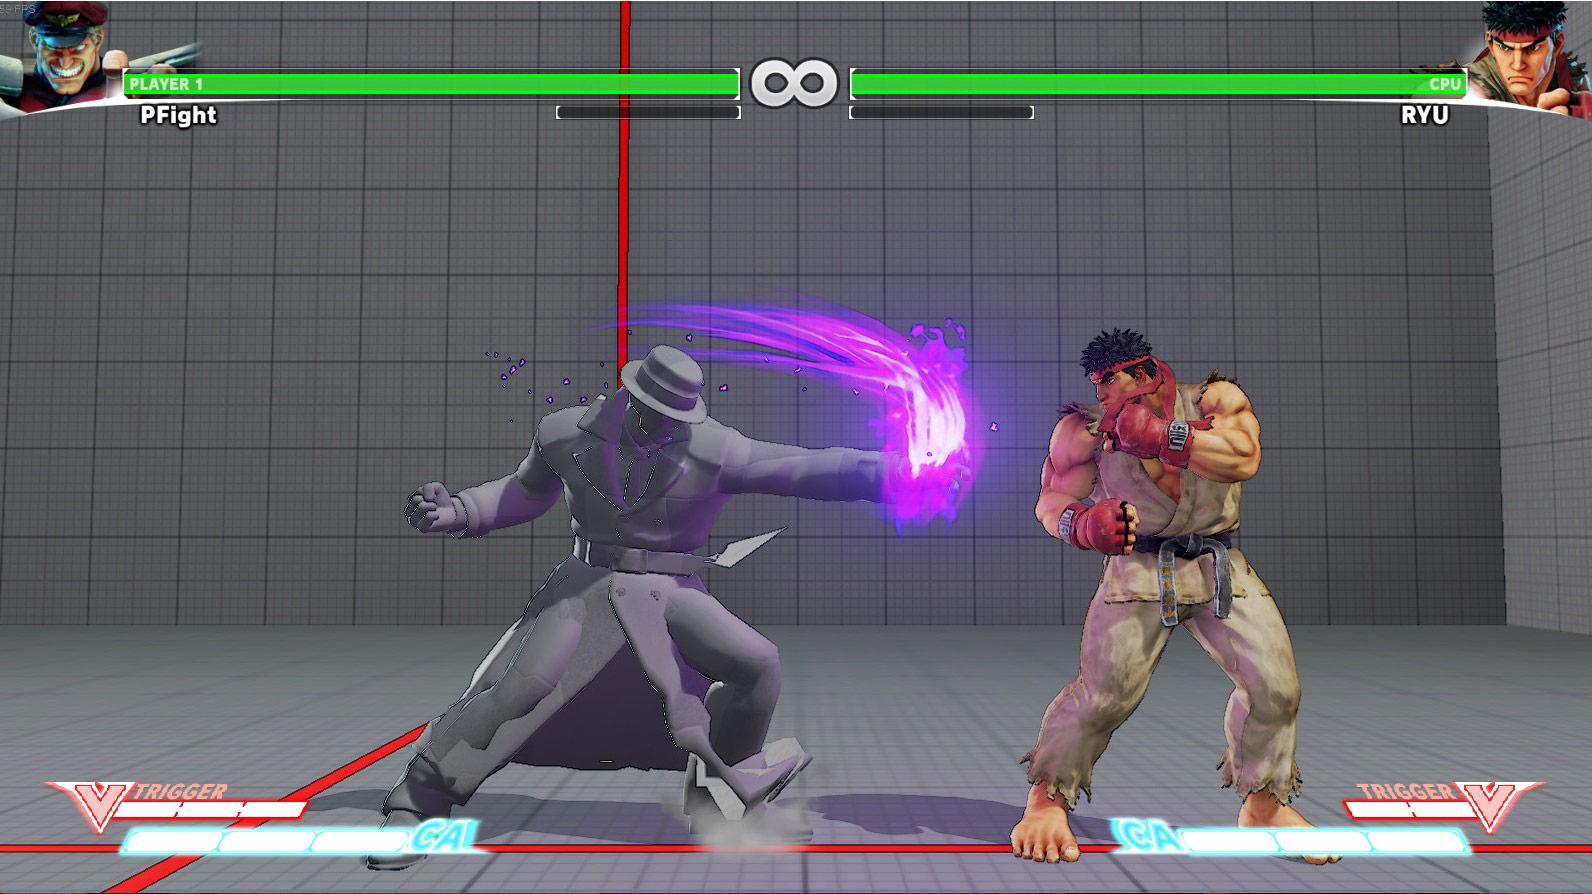 Q Street Fighter 4 Street Fighter 5 Q mod...